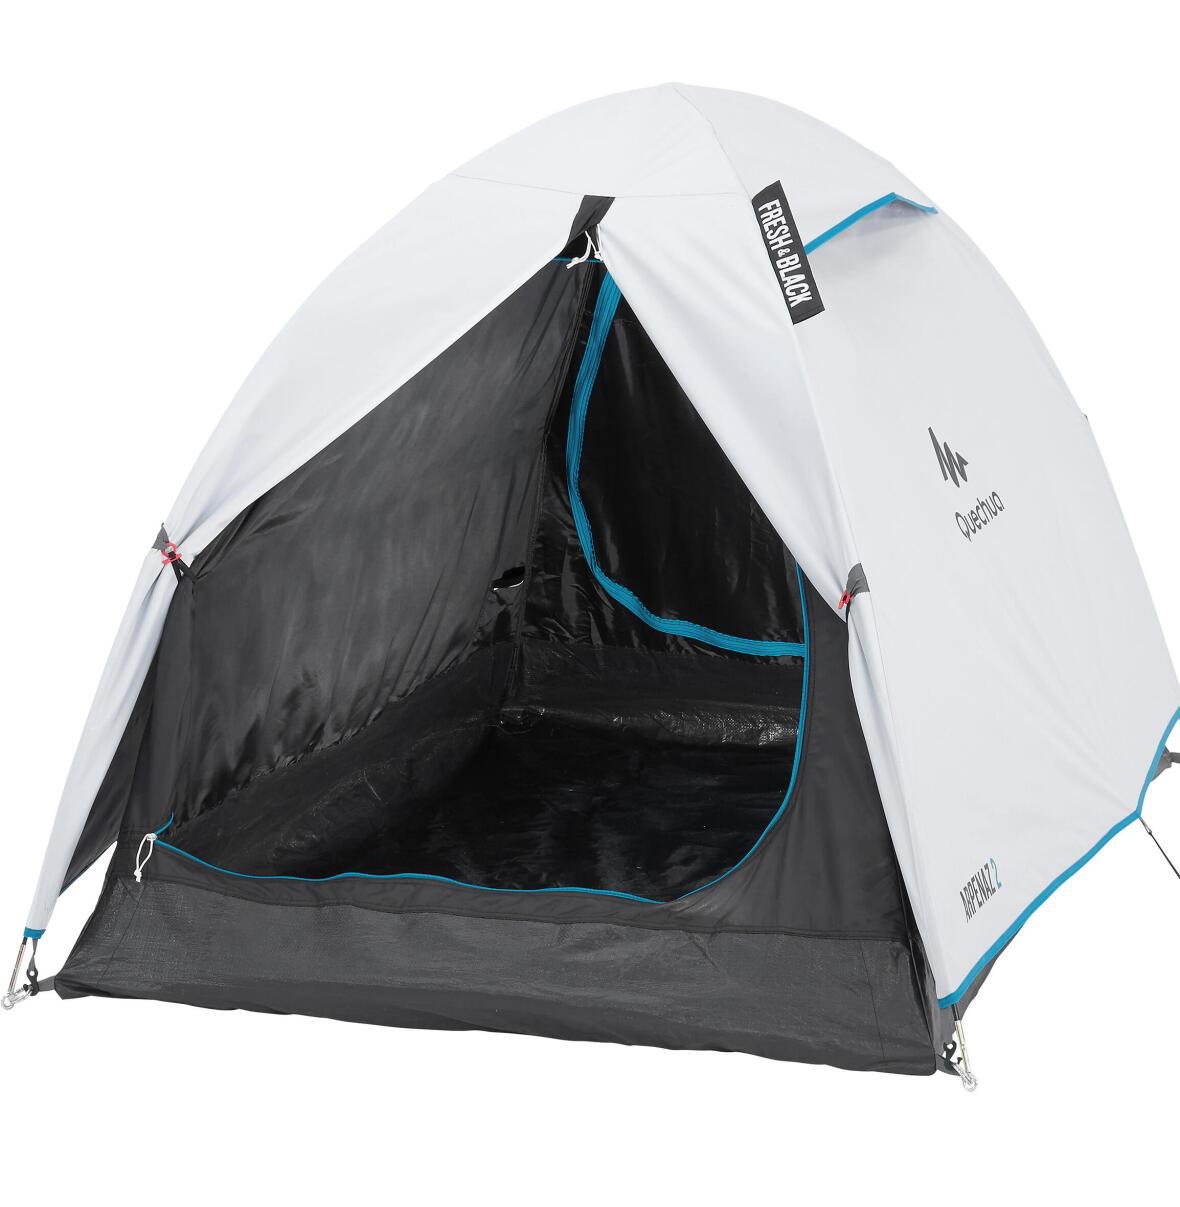 repair-pole-tent-arpenaz-2-person-fresh-and-black-quechua-broken